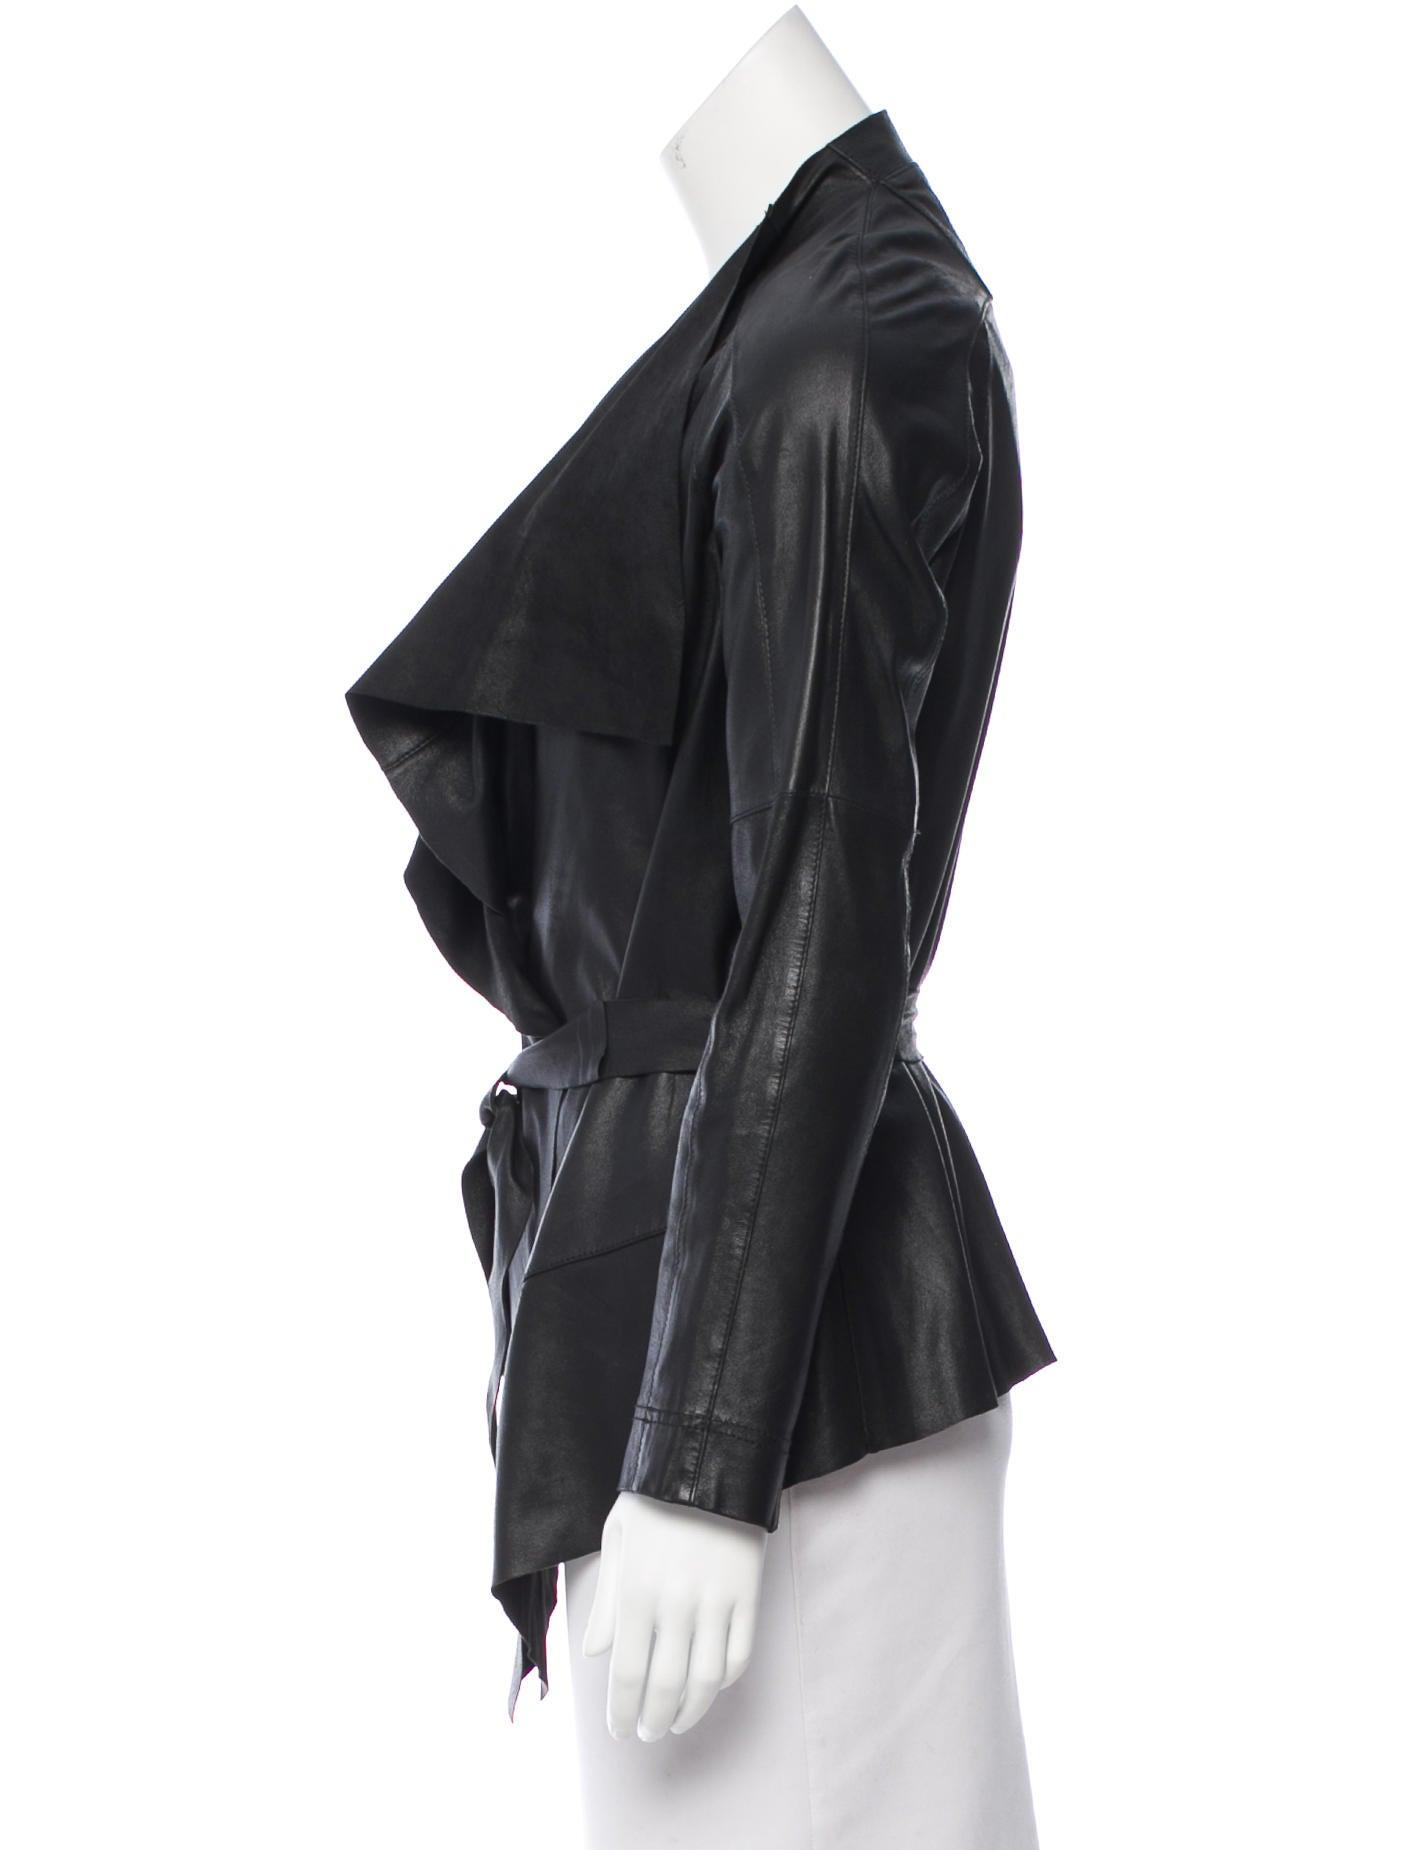 jacket product david blazer bliss asymmetrical lerner products drapes draped bandits